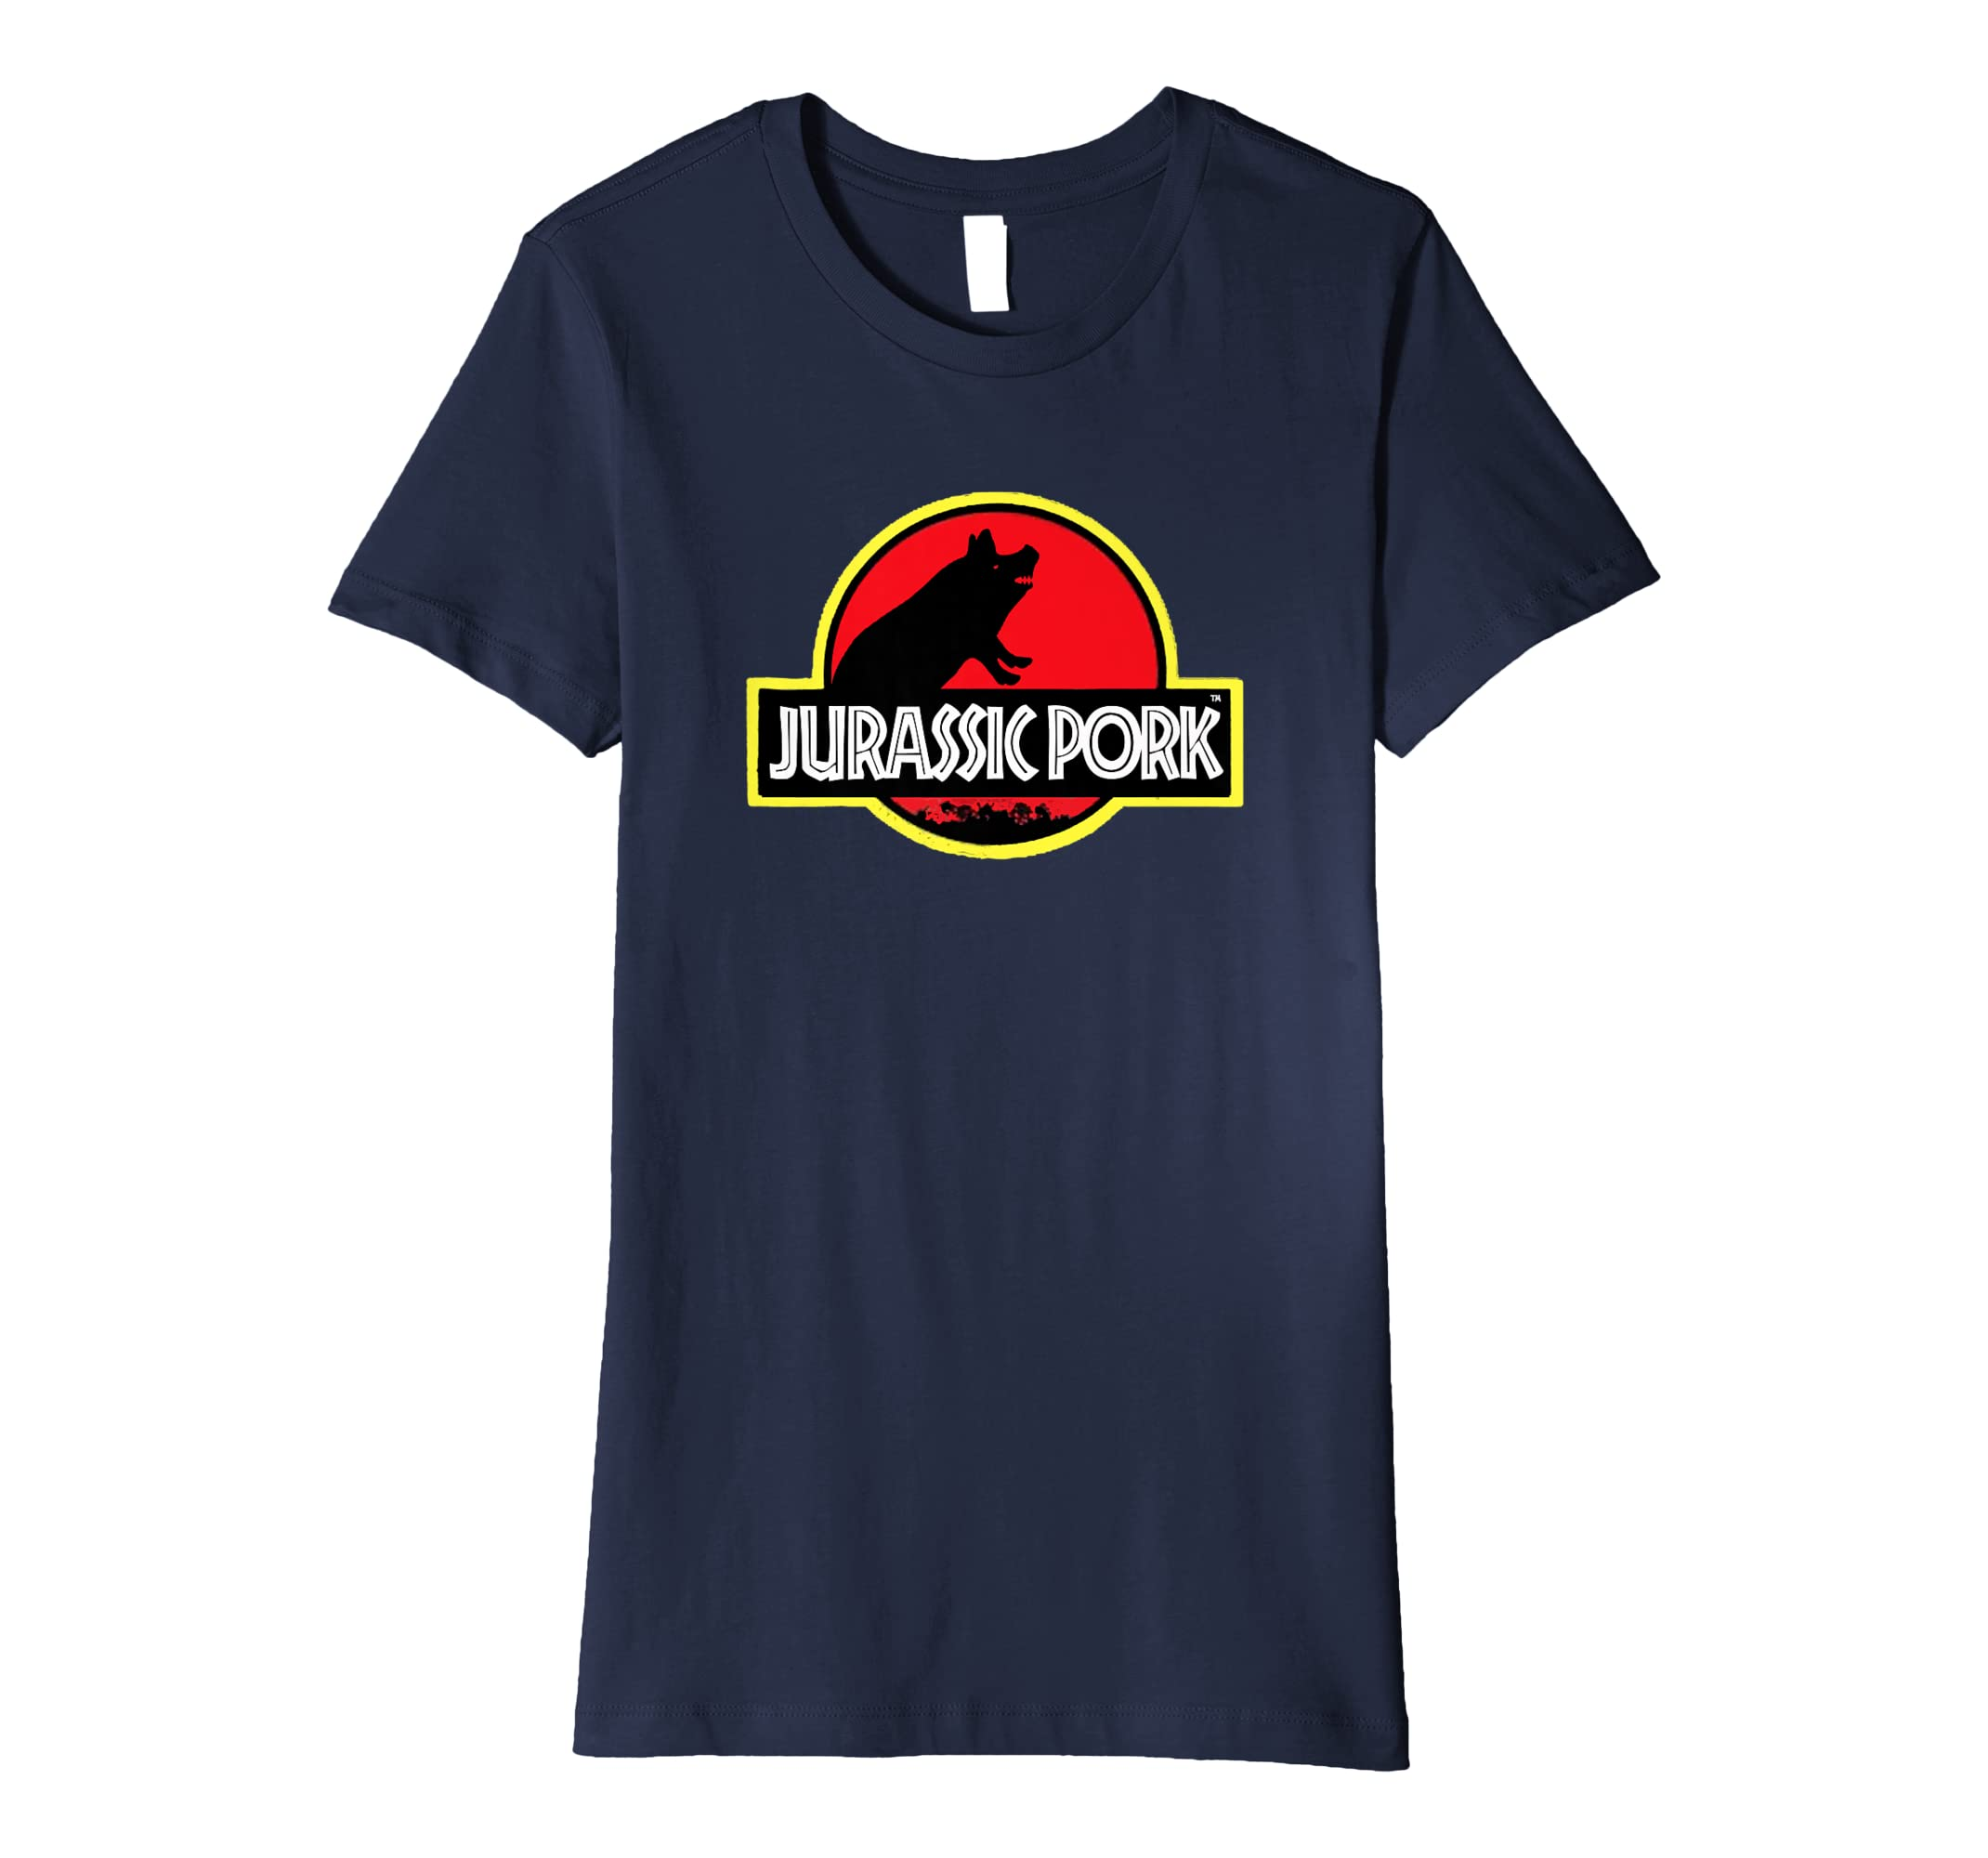 560932e6ea Amazon.com: Funny Jurassic Pork Pig Tee Shirt.: Clothing